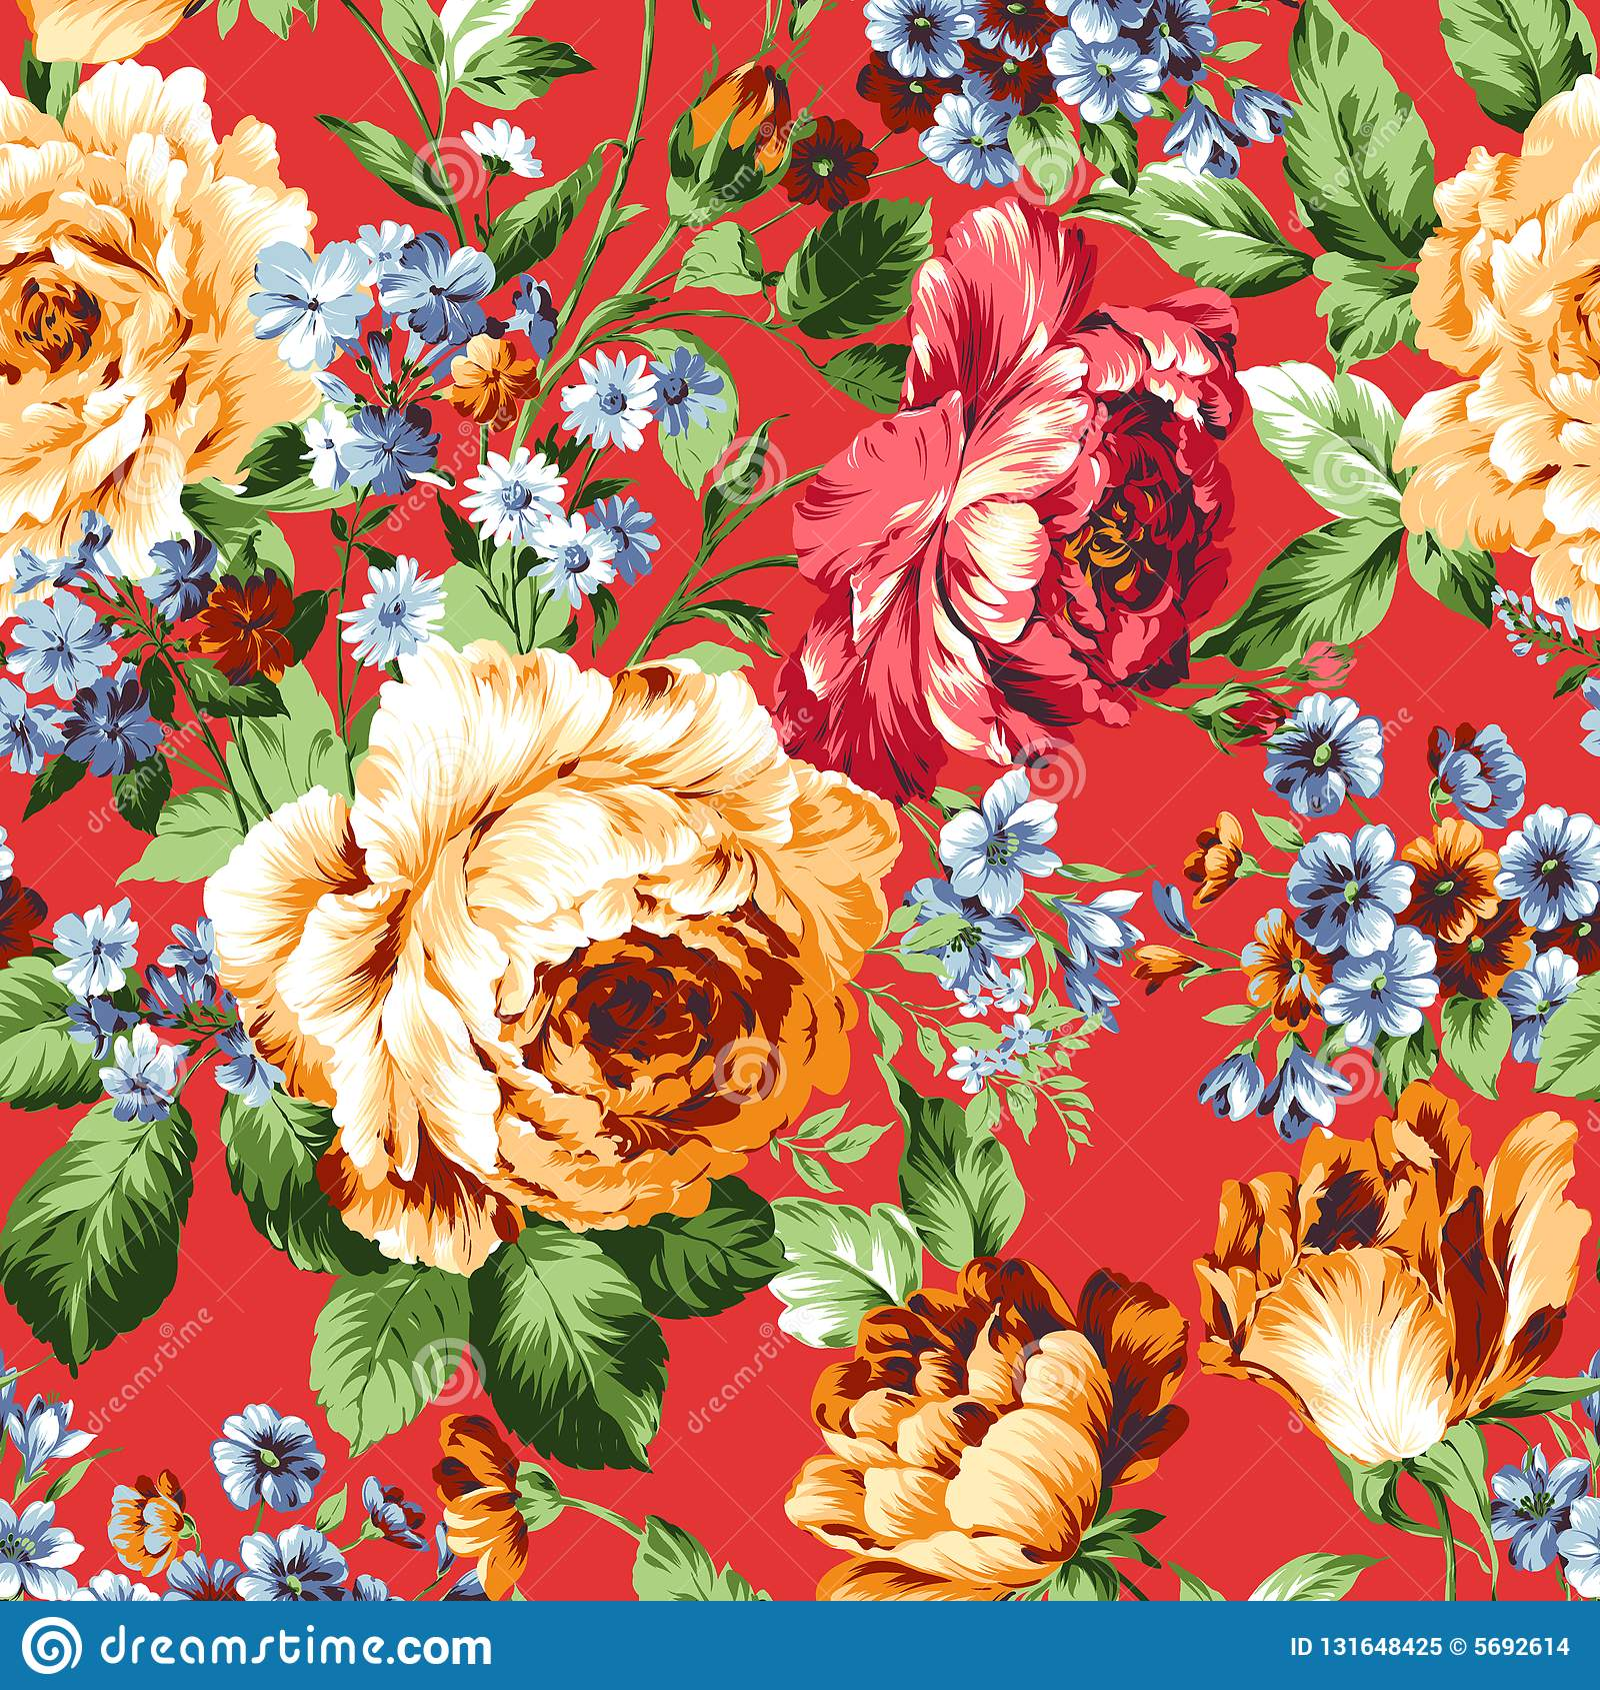 Flower Illustration pattern in simple background